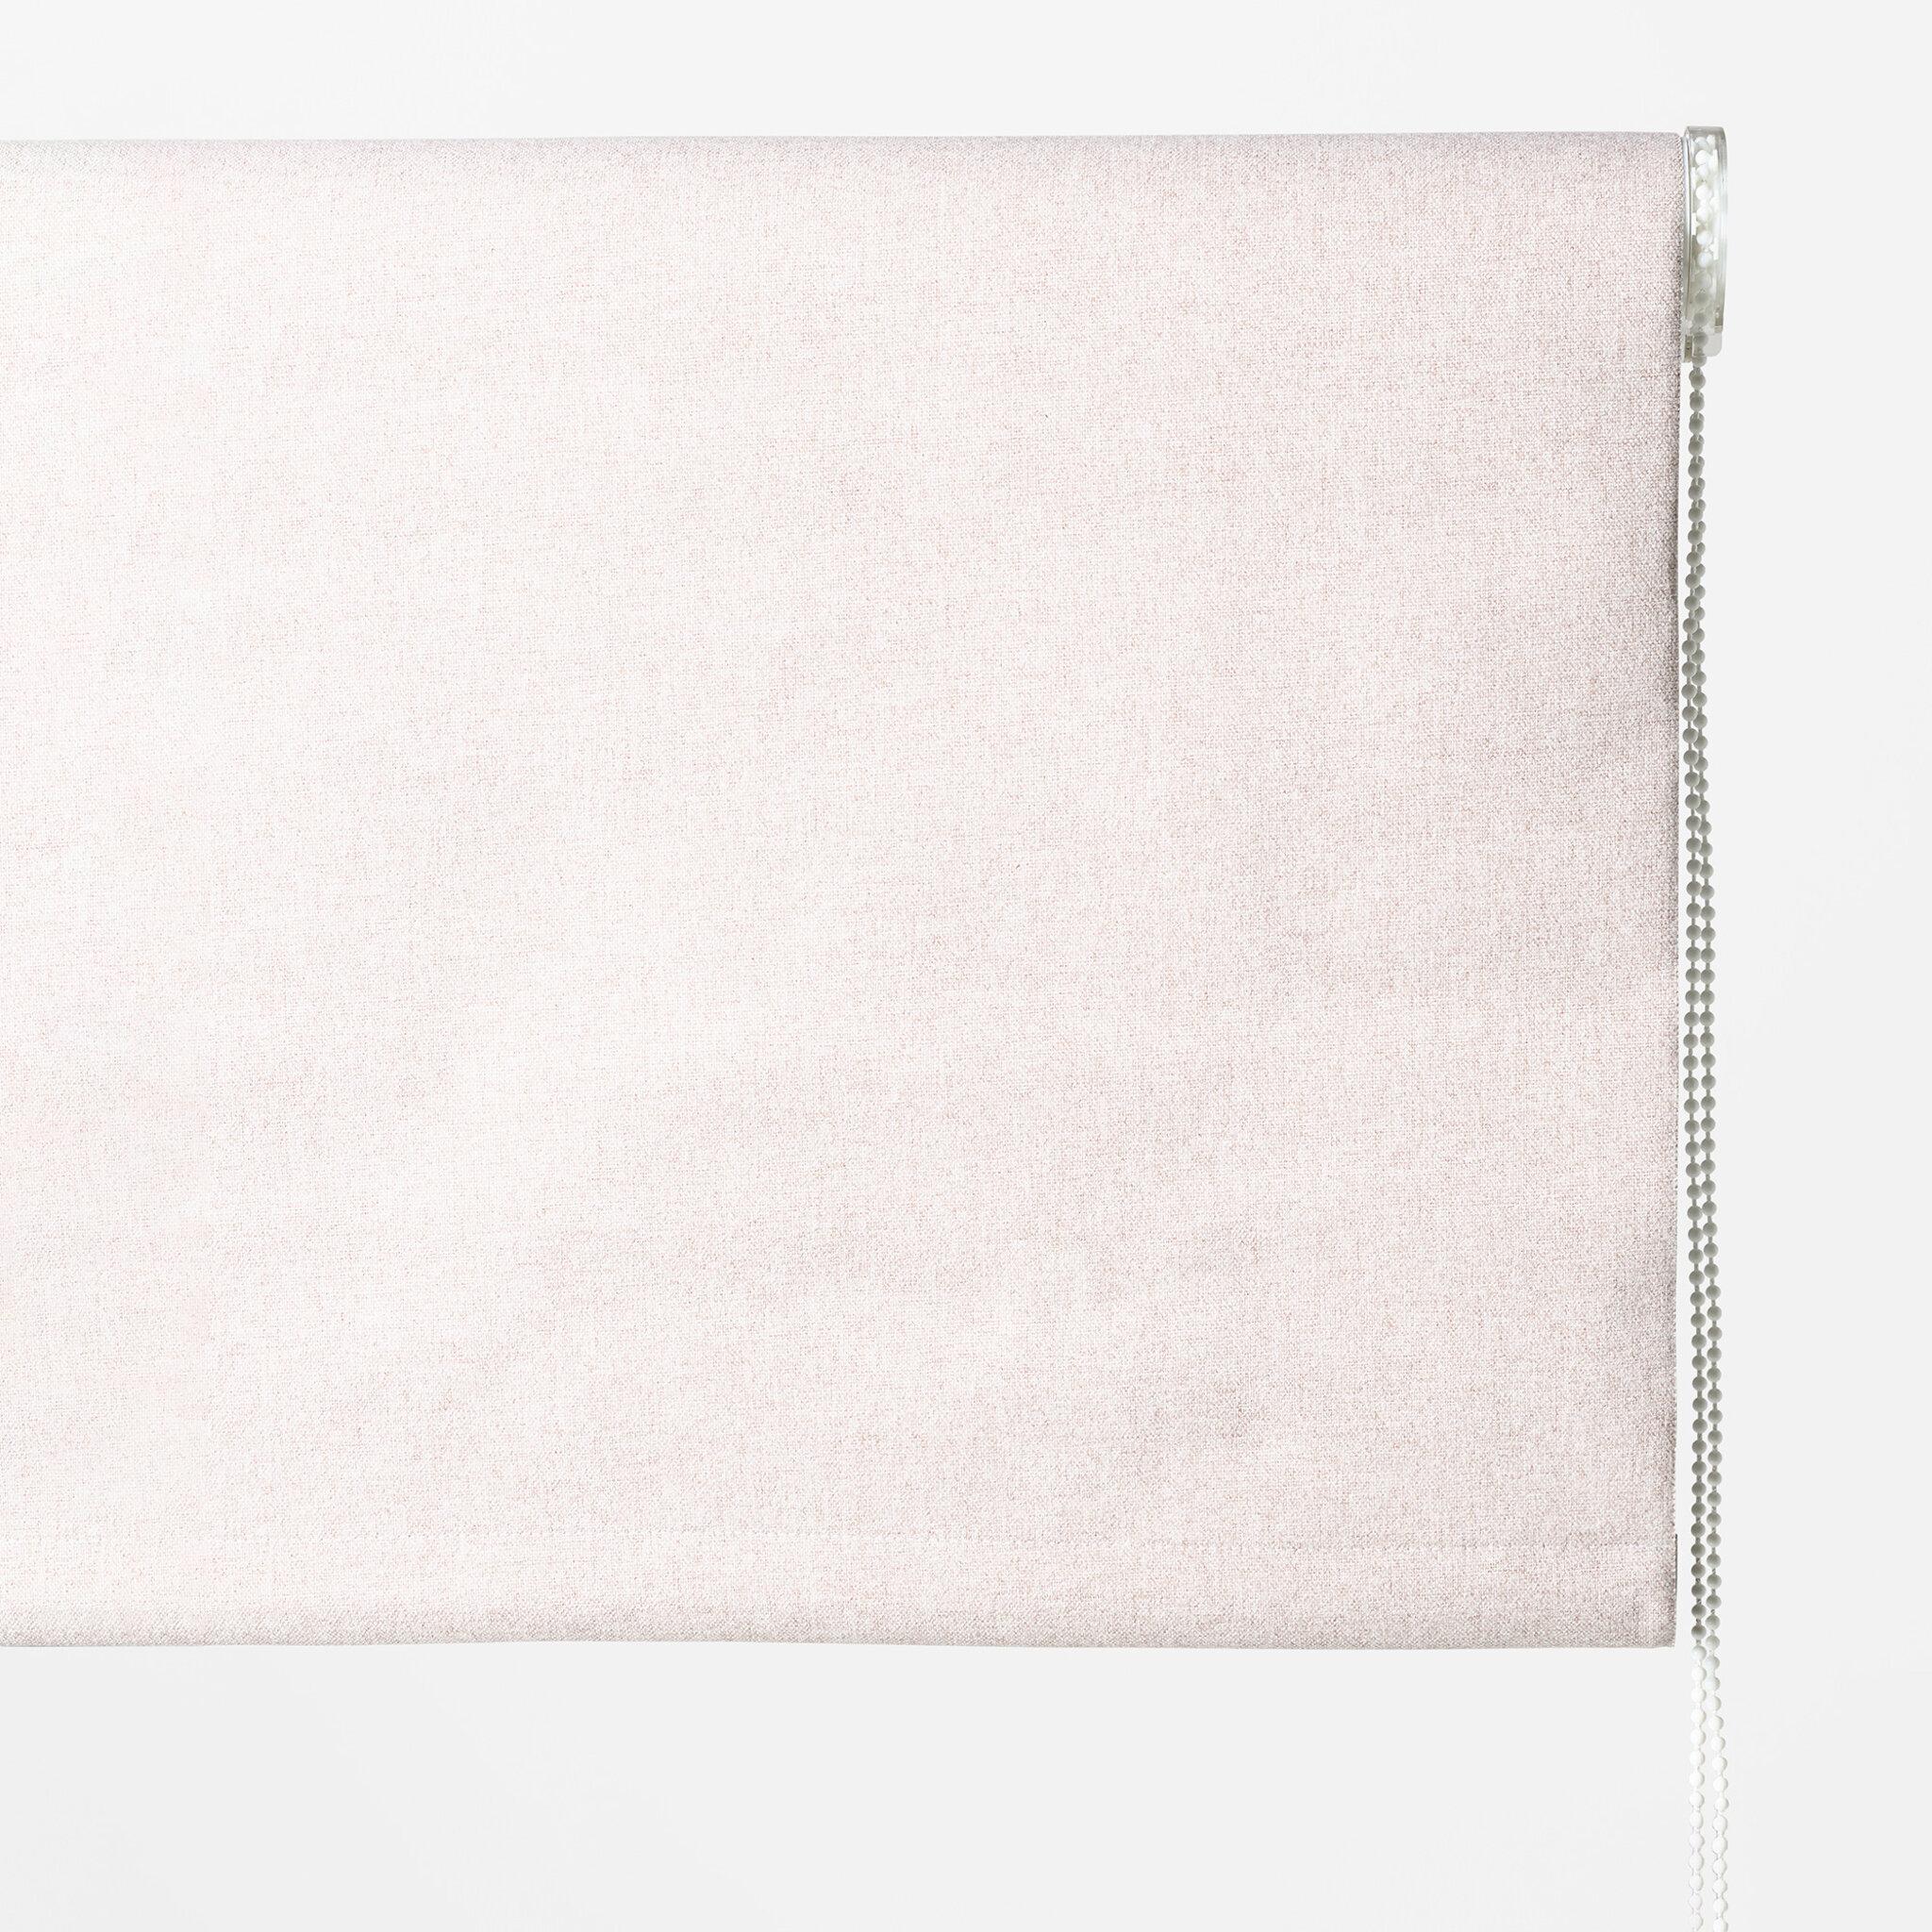 Rullgardin SOVMORGON 120x165 cm